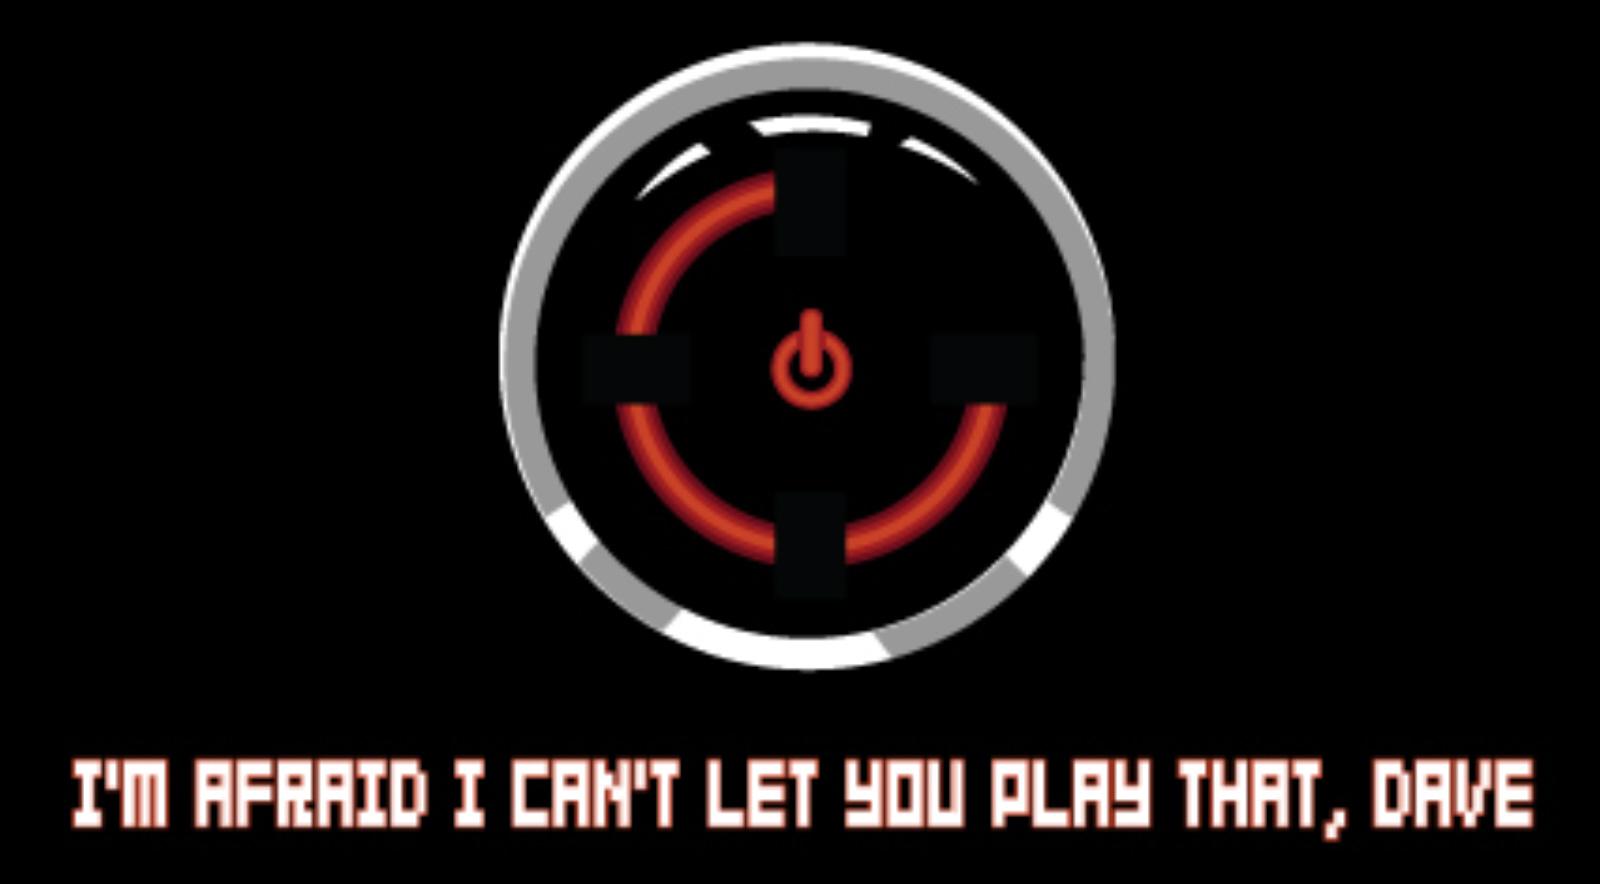 Xbox Slim Red Ring Wallpaper | Watch Us P...